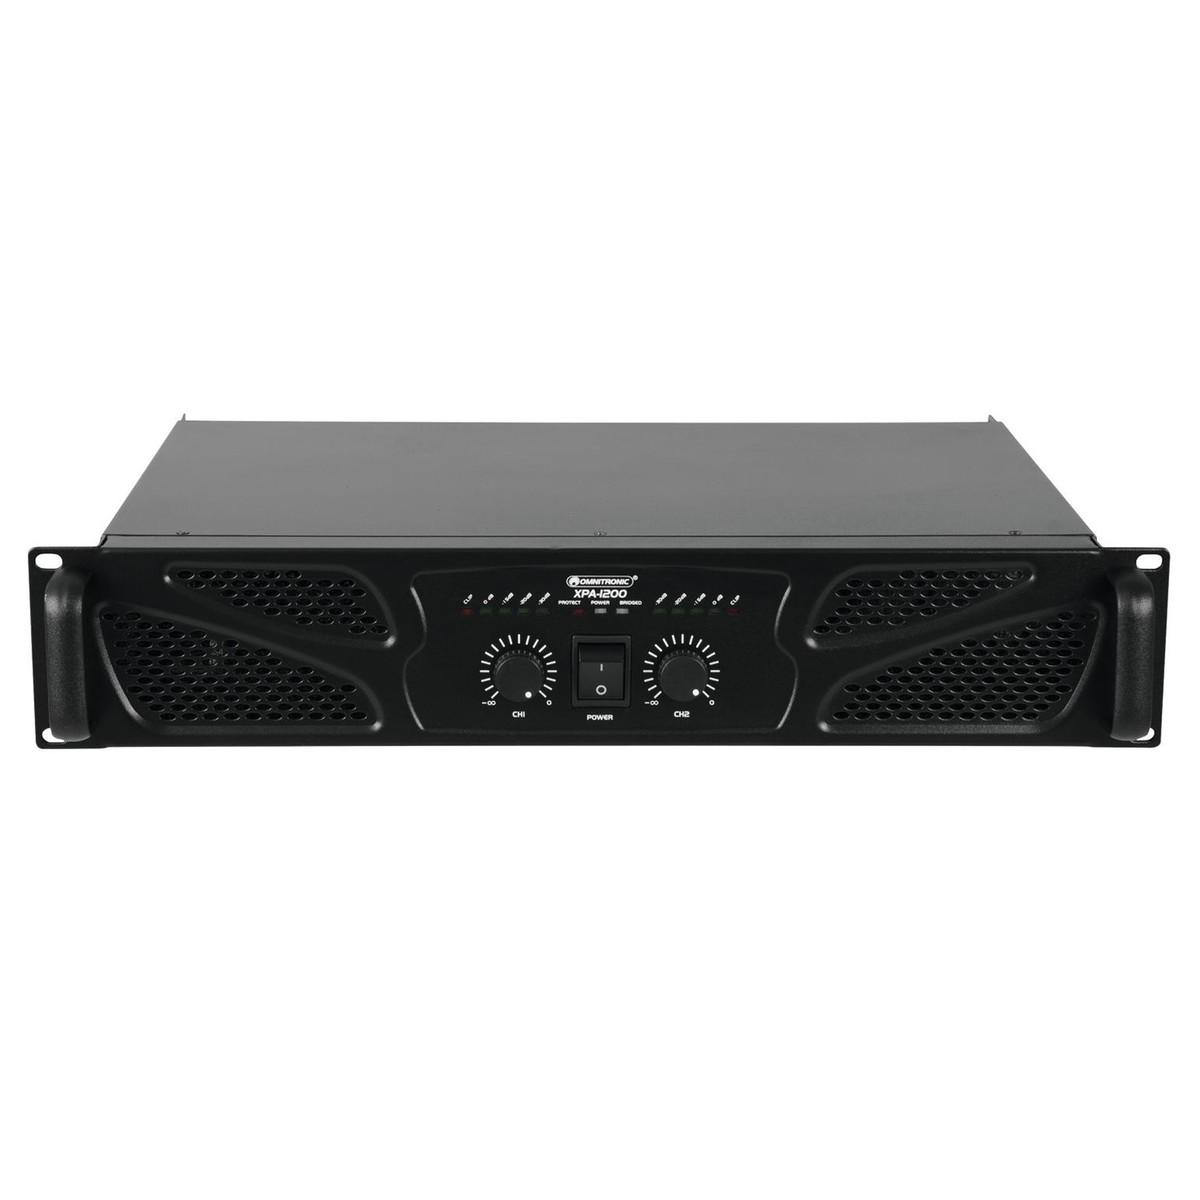 Omnitronic Xpa 1200 Amplifier At Gear4musiccom 610w Telephone Wall Socket Wiring